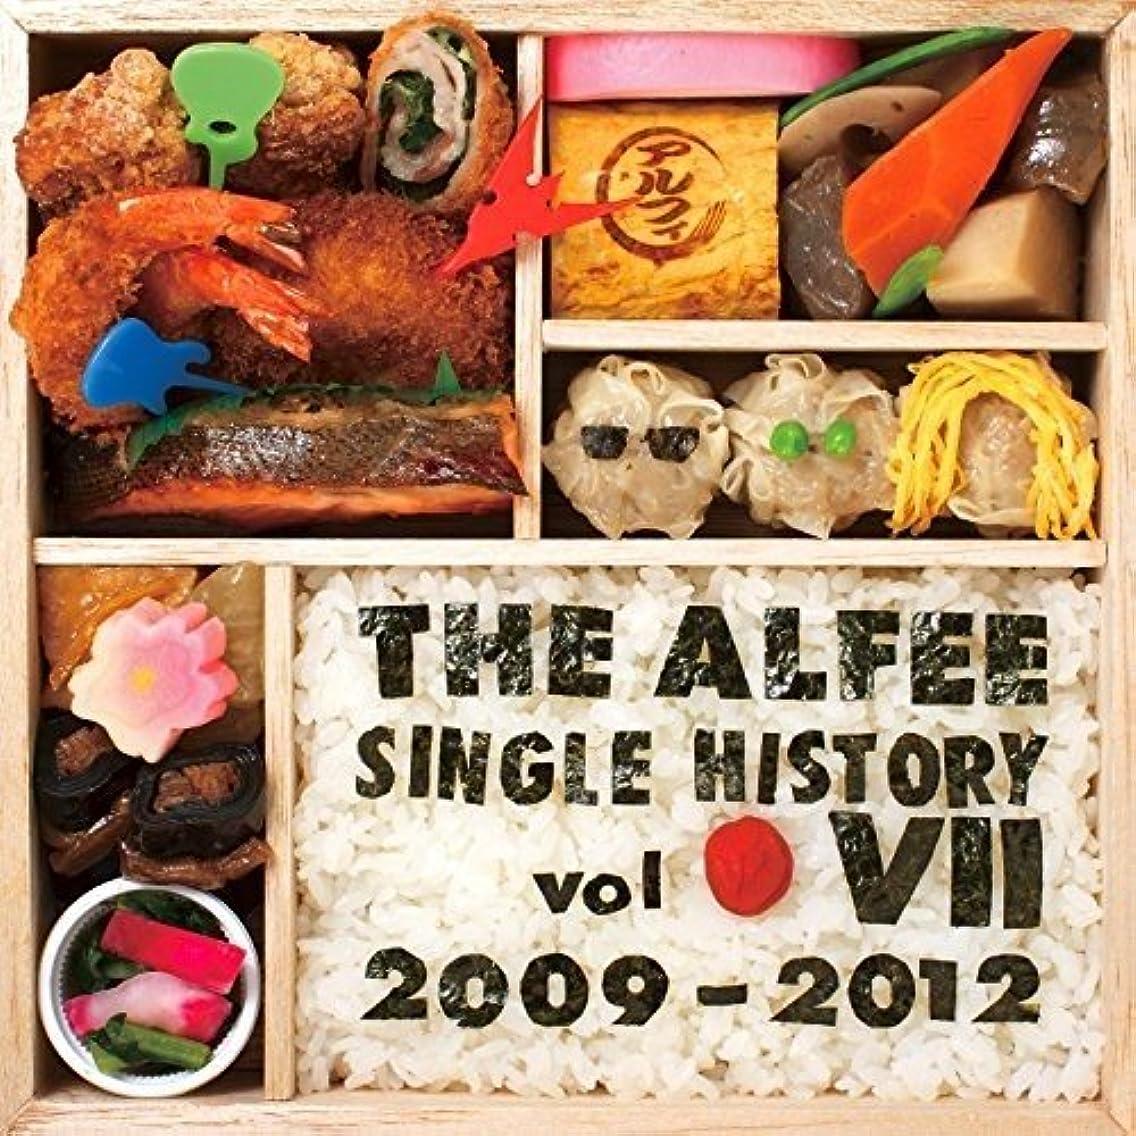 Single History Vol 7 2009-2013